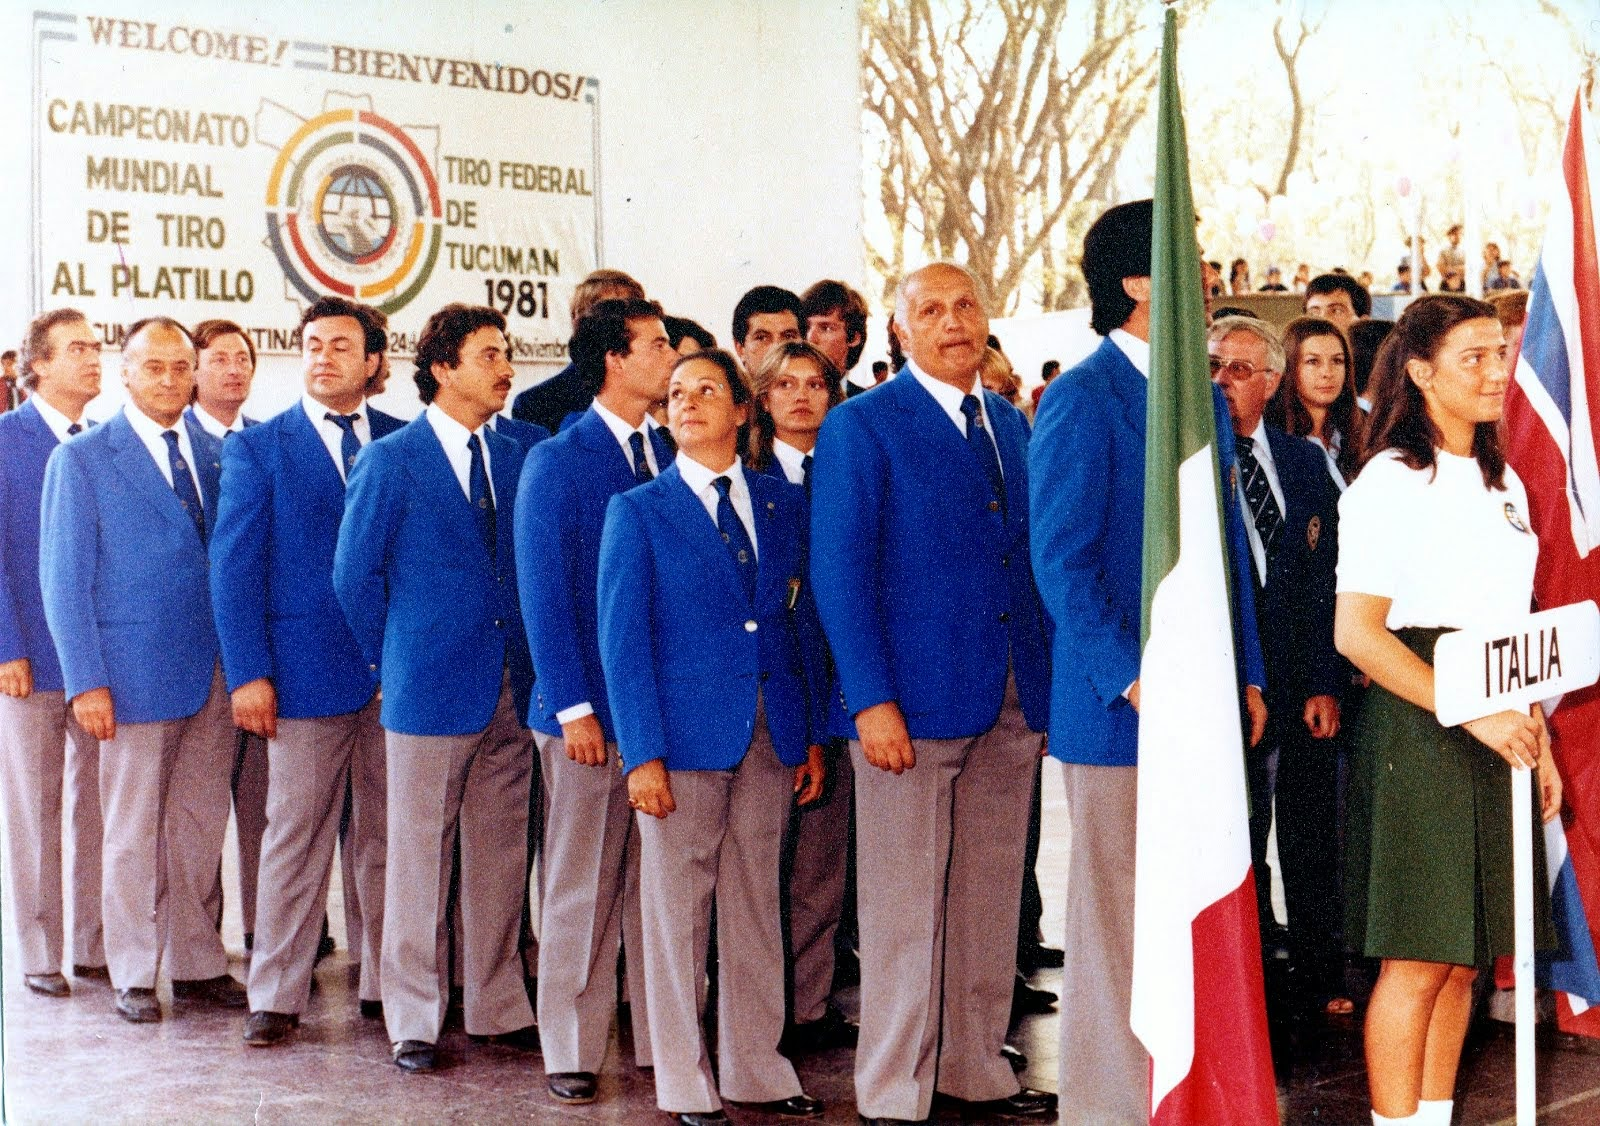 1981 - Campionato del Mondo - Tucuman - Argentina